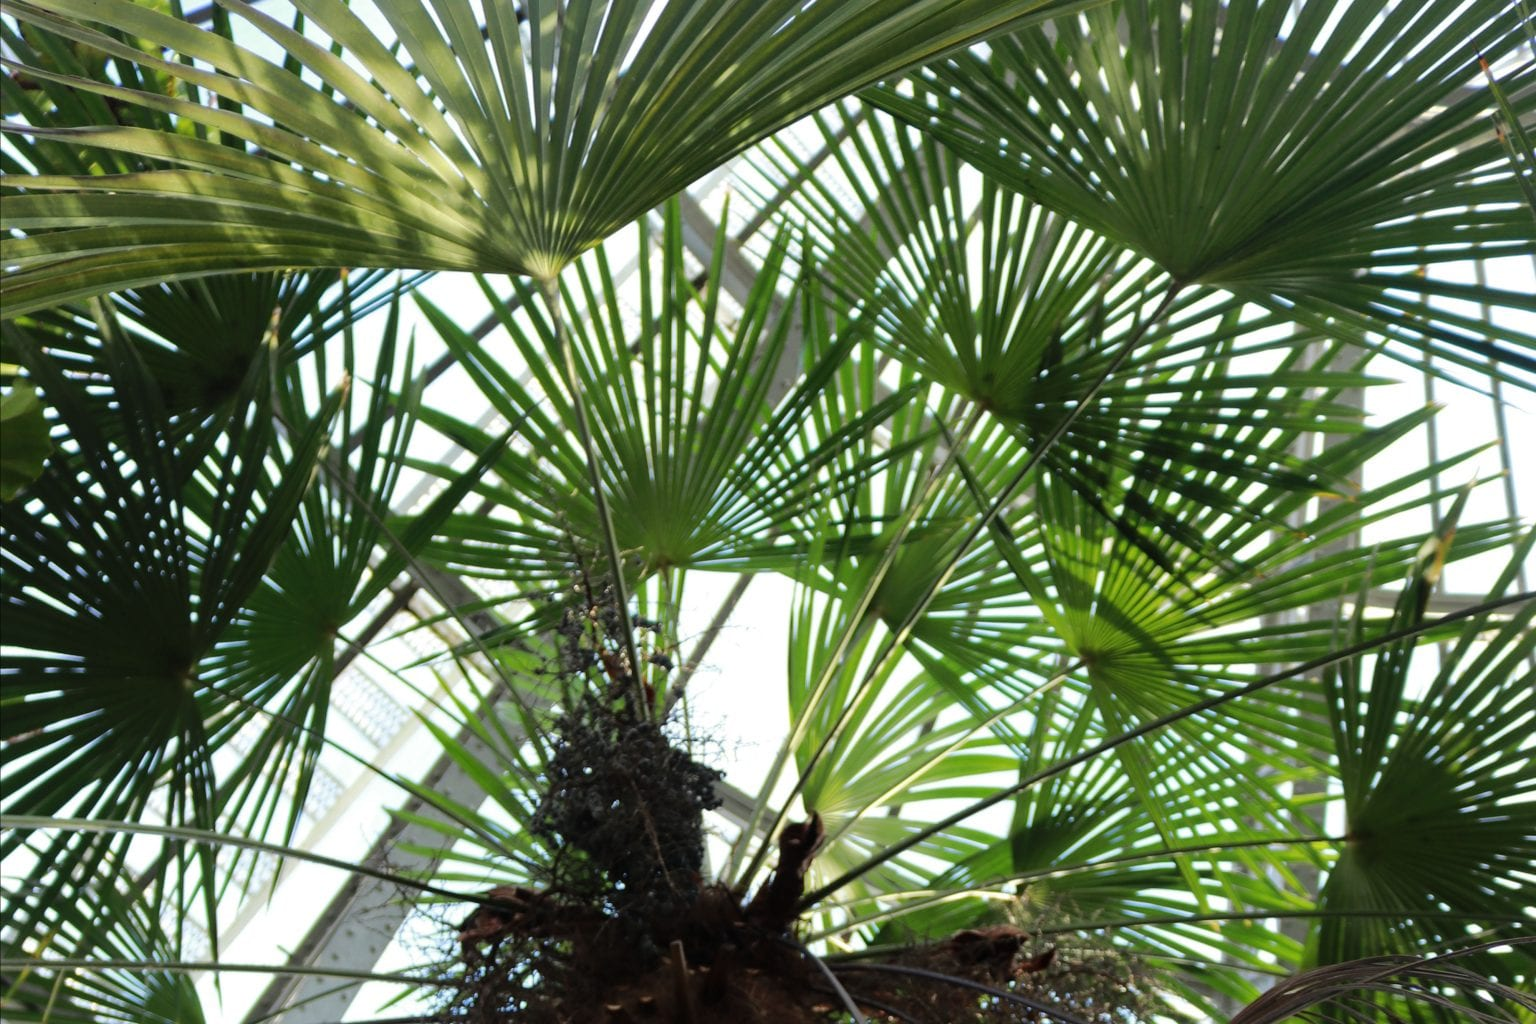 Hortus-plant-collection-3